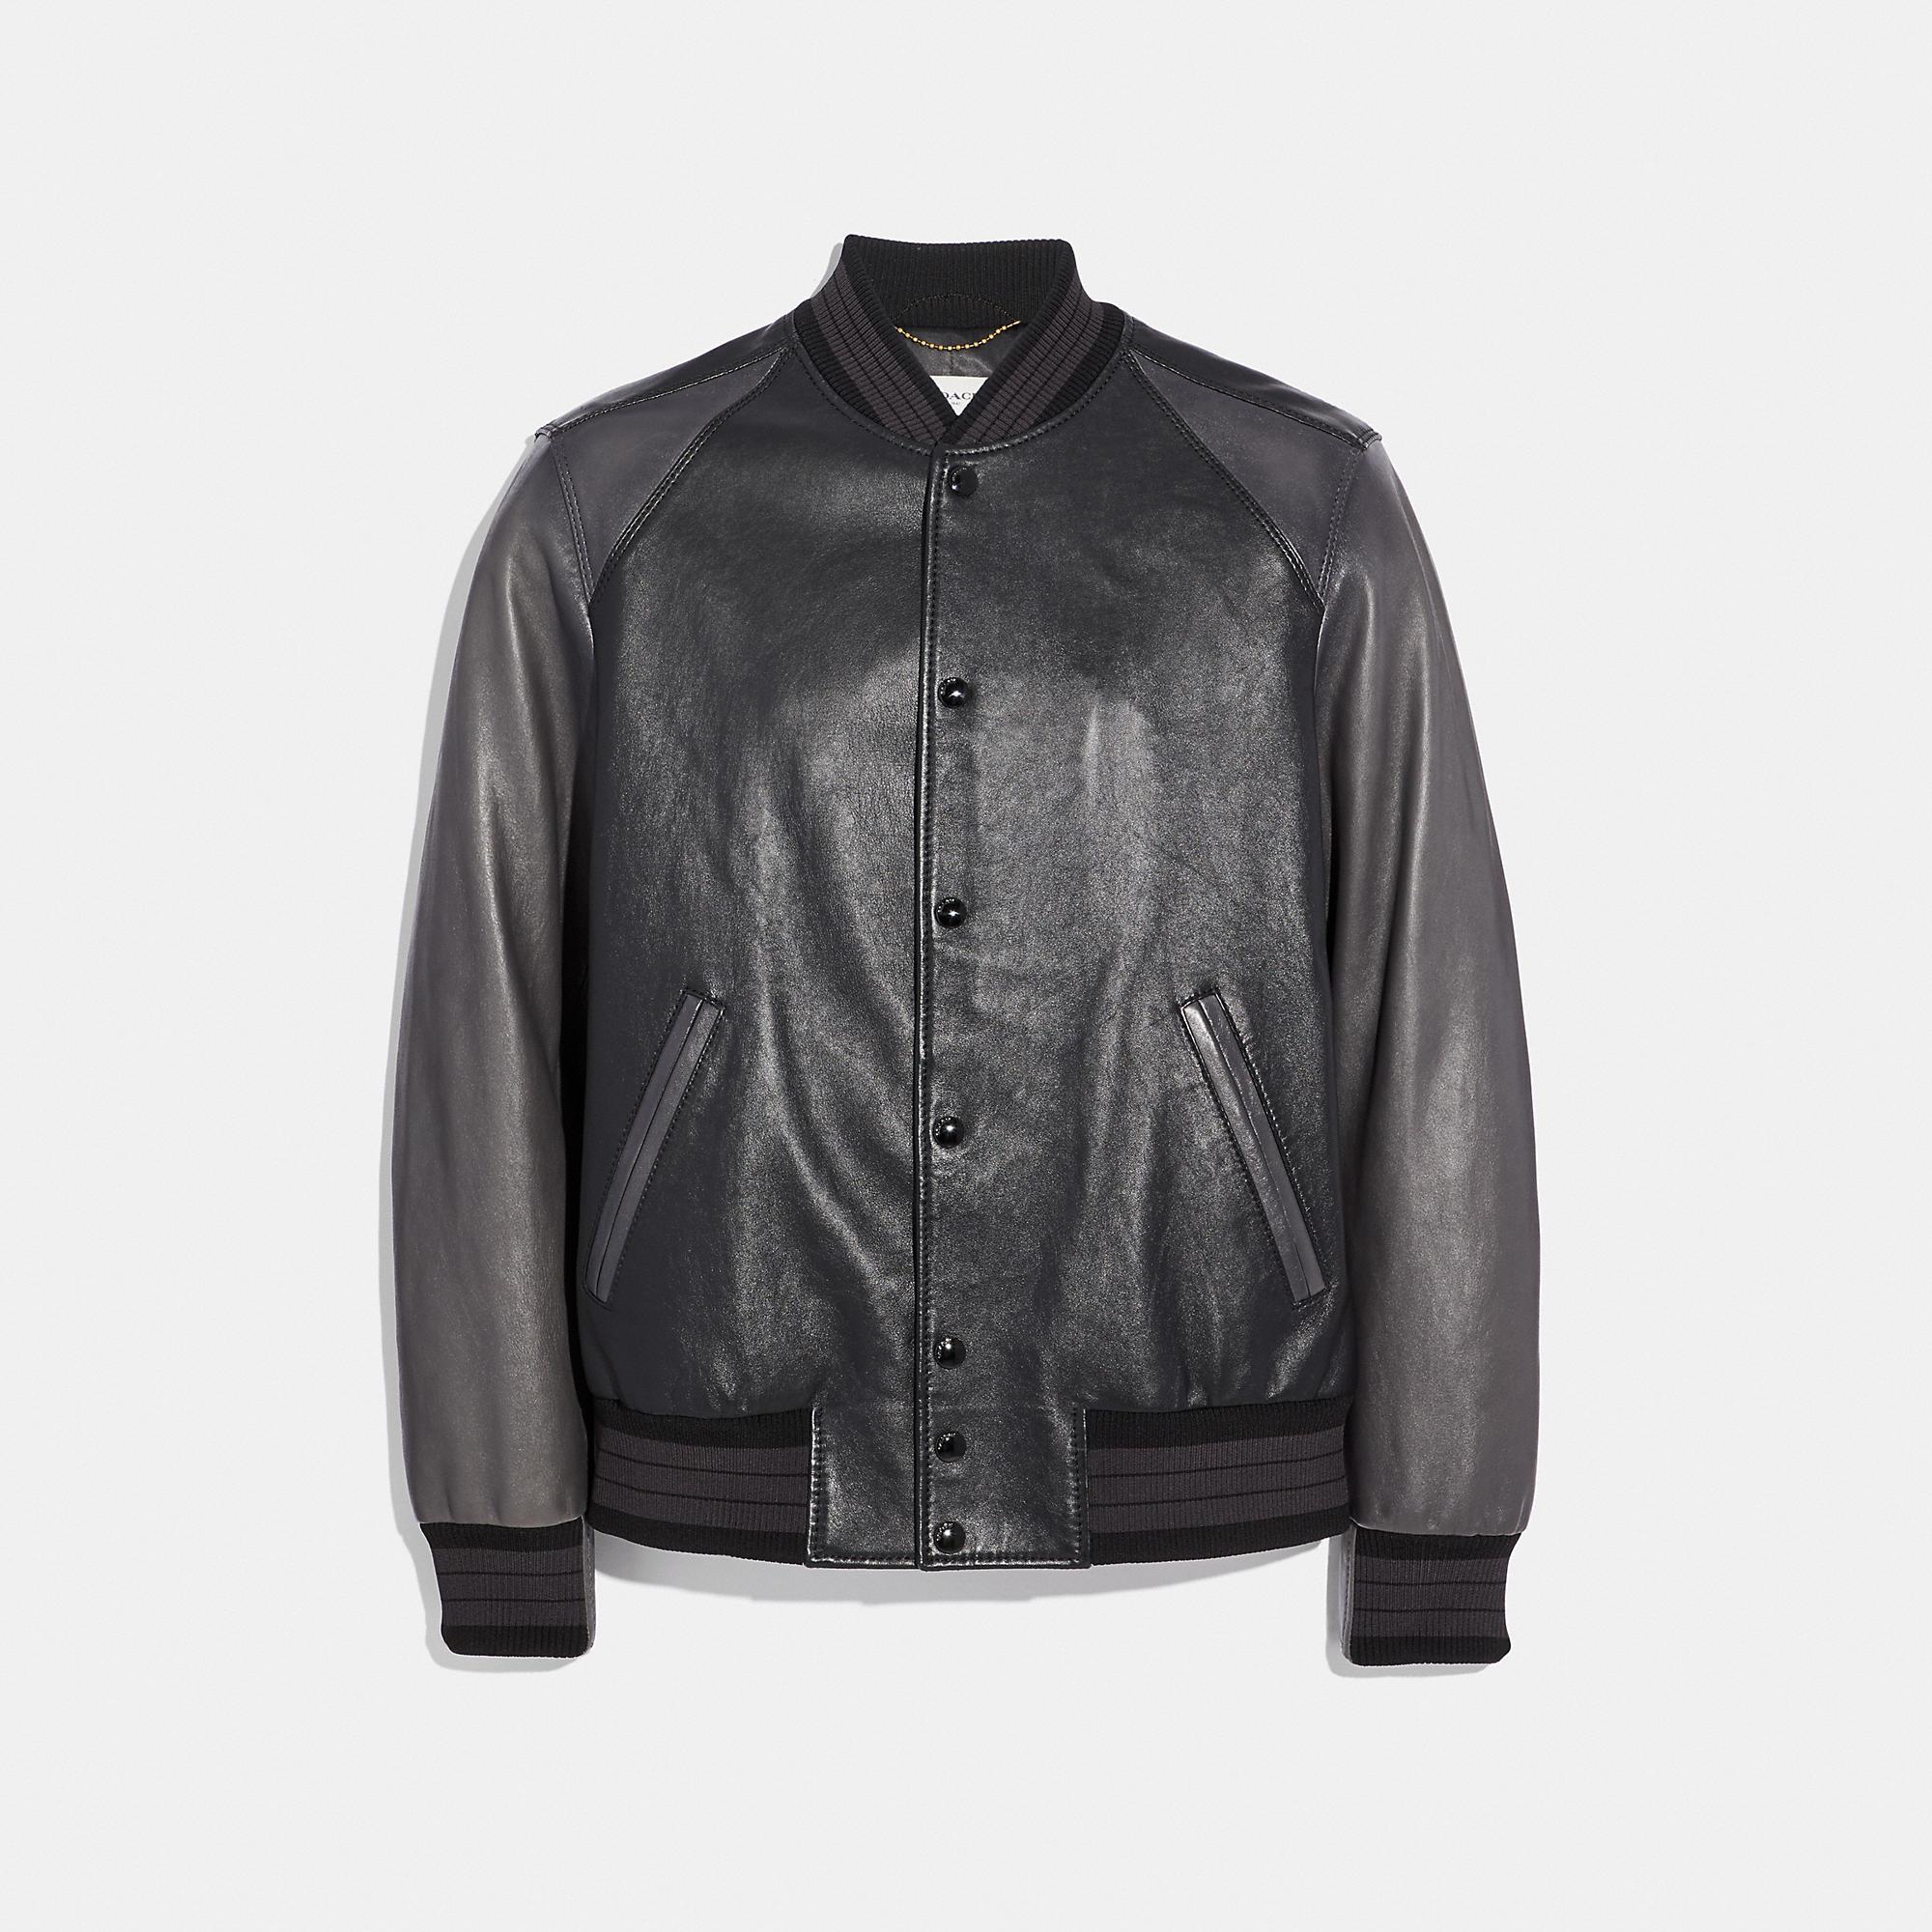 Coach Leather Varsity Jacket In Black Size 48 Modesens In 2020 Leather Varsity Jackets Fleece Varsity Jacket Varsity Jacket Outfit [ 2000 x 2000 Pixel ]